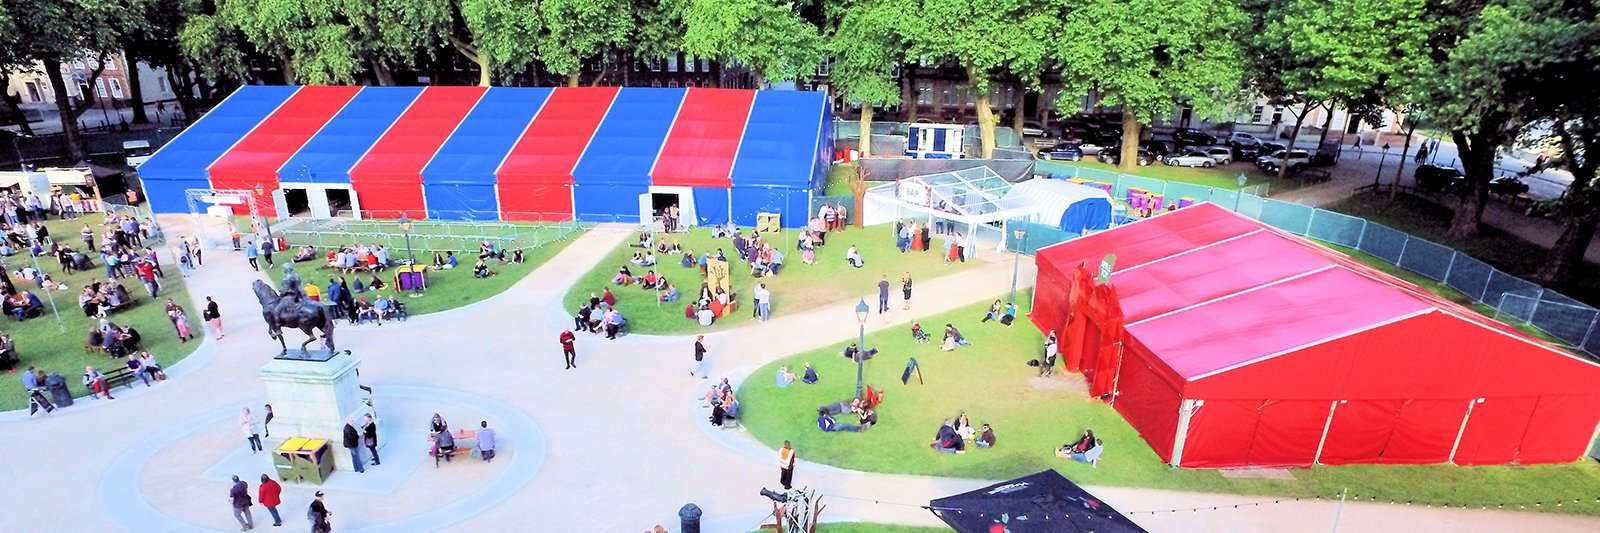 Bristol Comedy Garden Festival Marquee